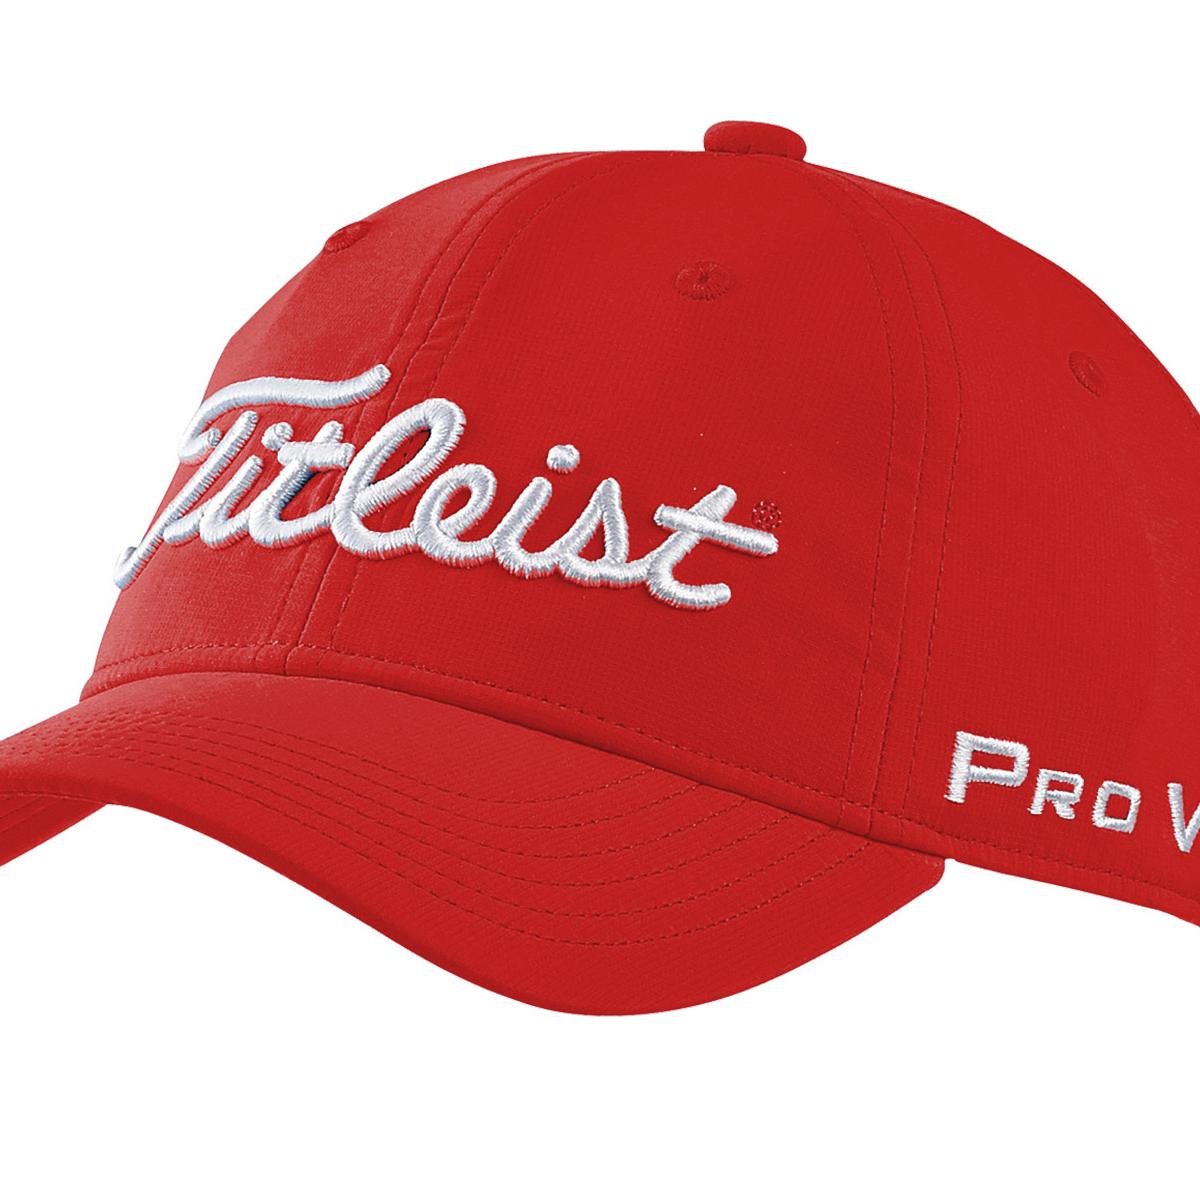 Titleist Cap Performance S7 · Titleist Cap Performance S7 ... 0726710aa96